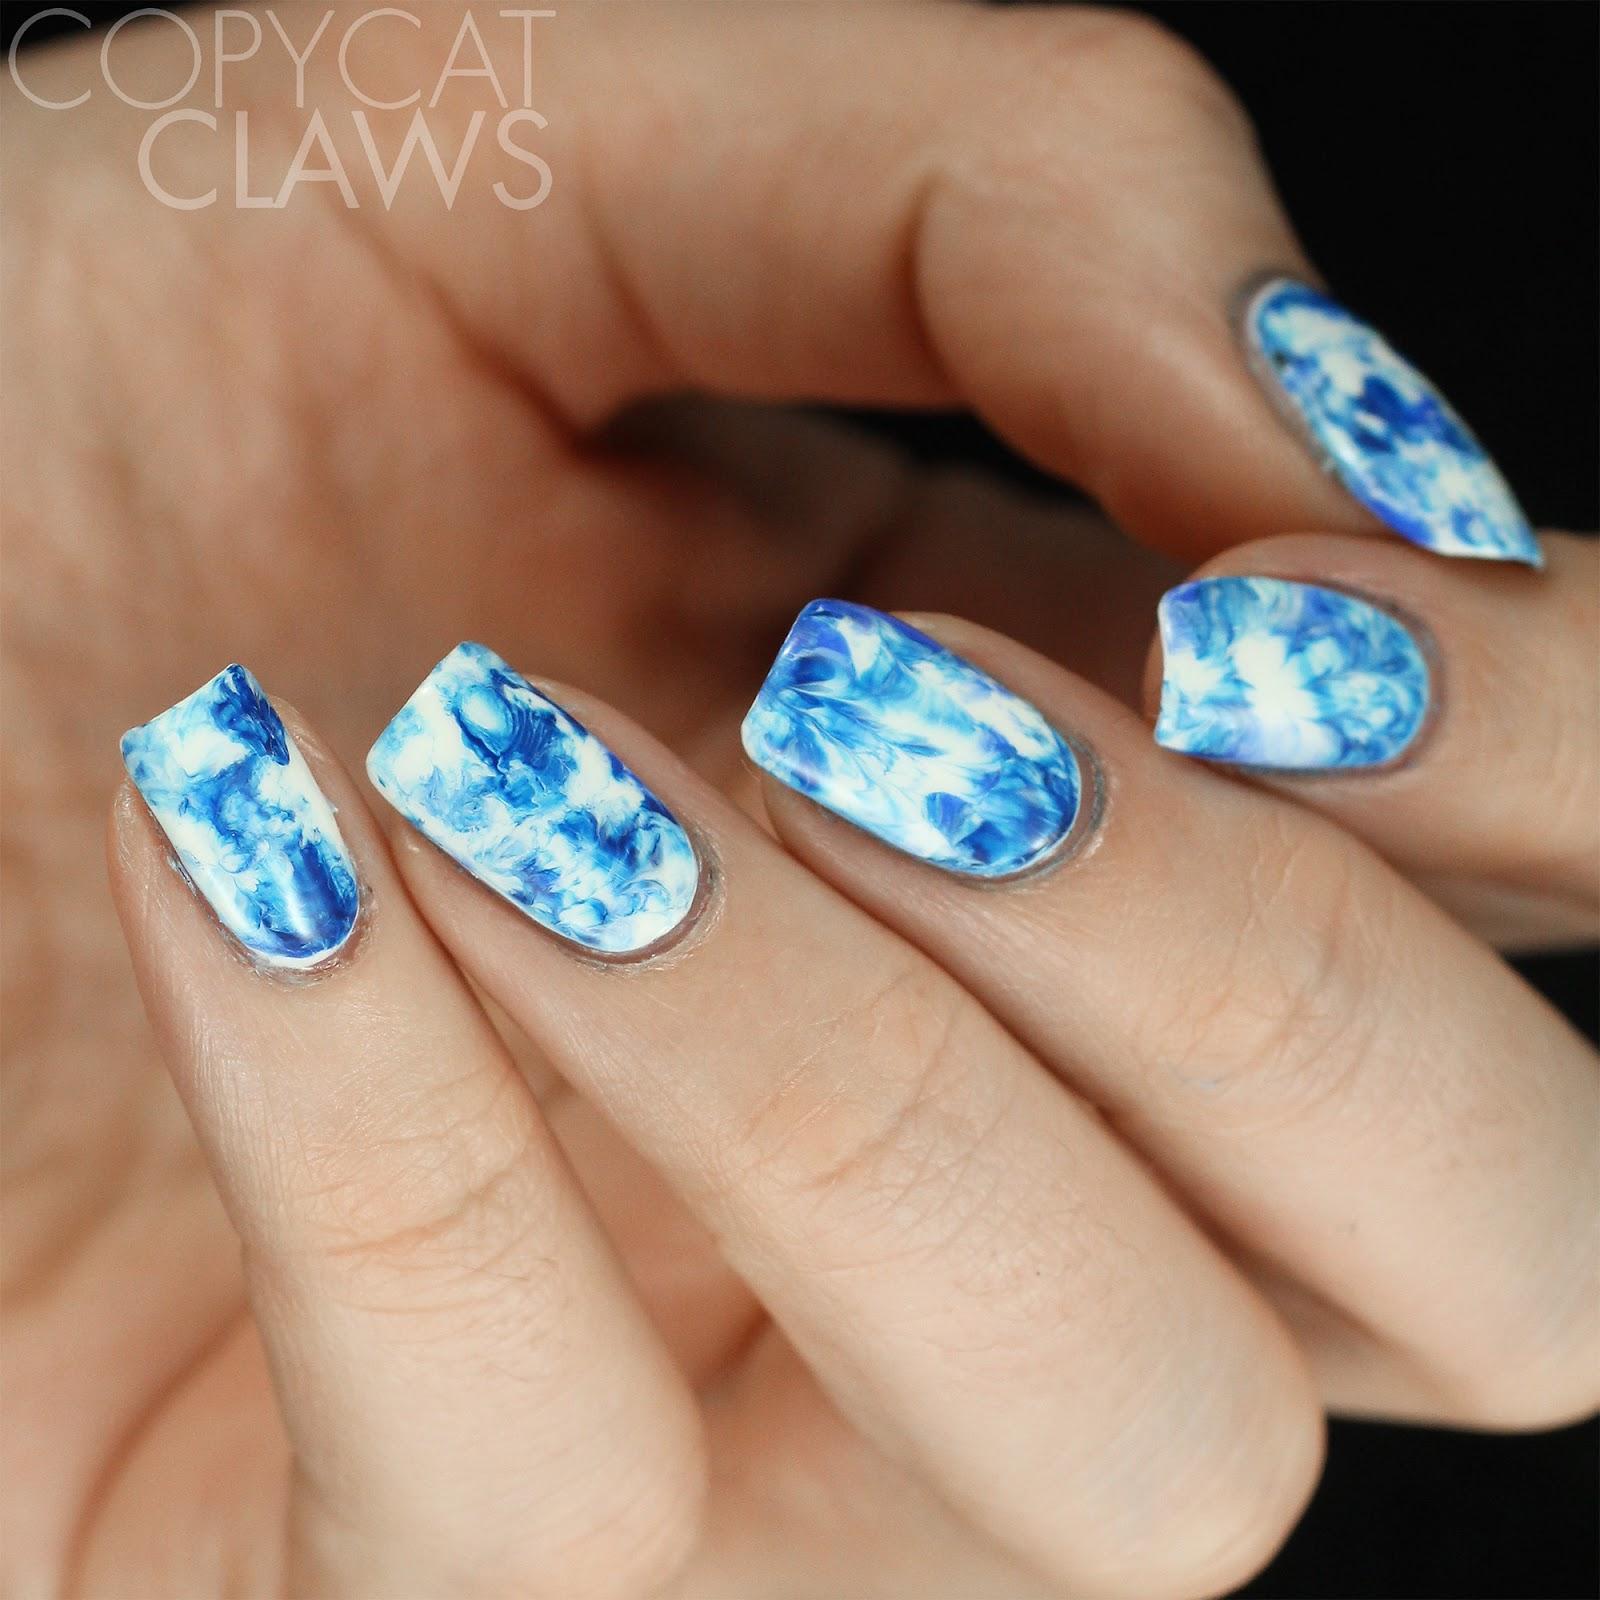 Copycat Claws Blue Color Block Nail Art: Copycat Claws: Nail Crazies Unite: Blue & White